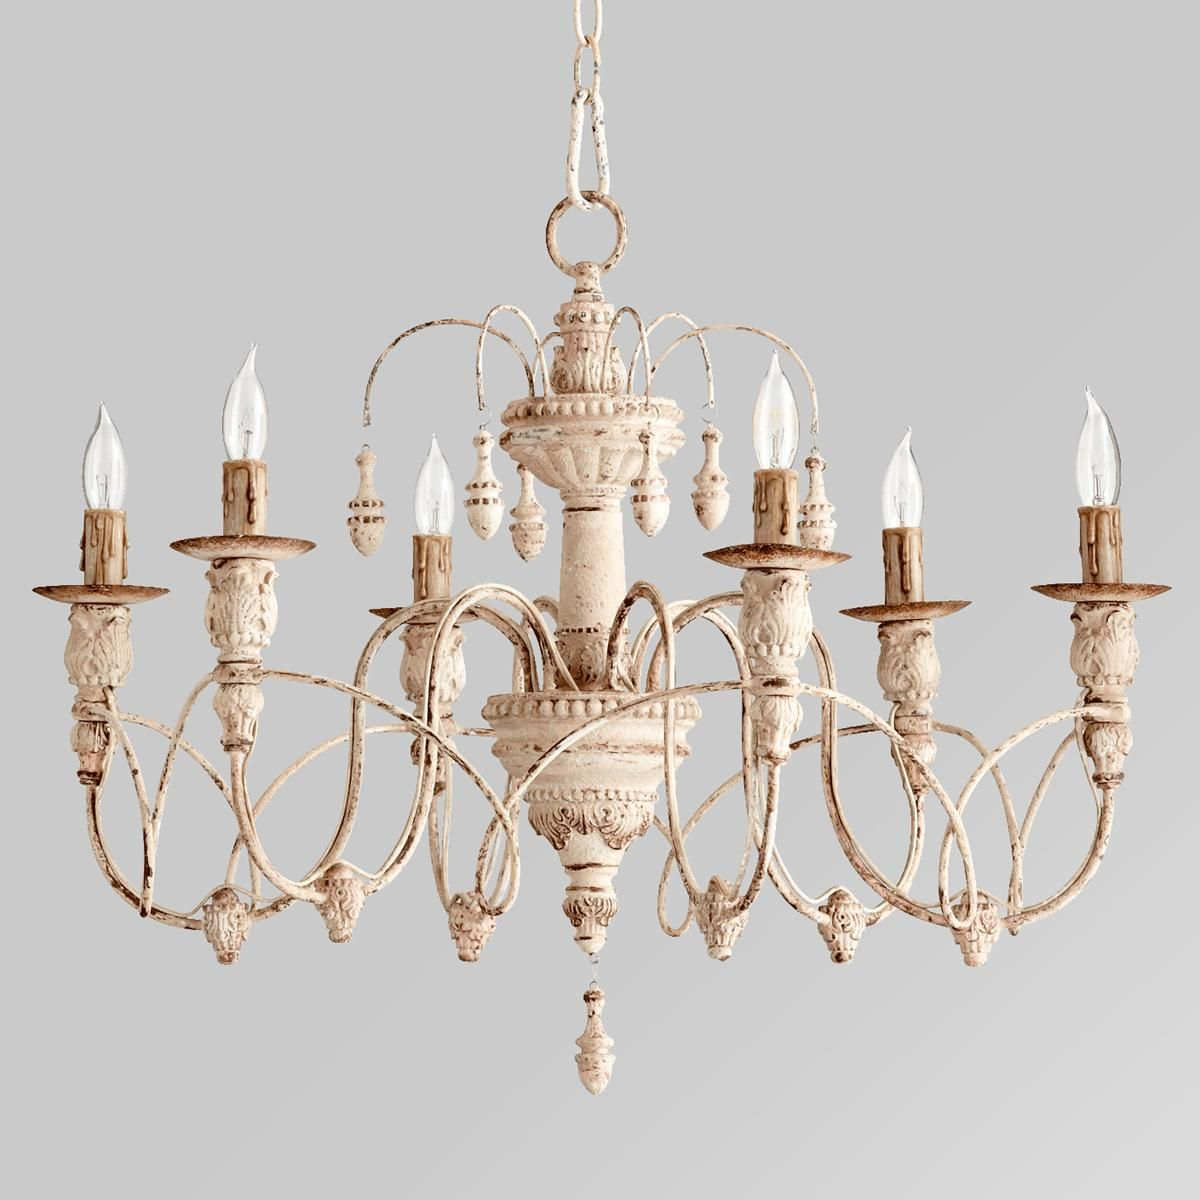 Gustavian style white chandelier veranda magazine chandeliers gustavian style white chandelier arubaitofo Gallery